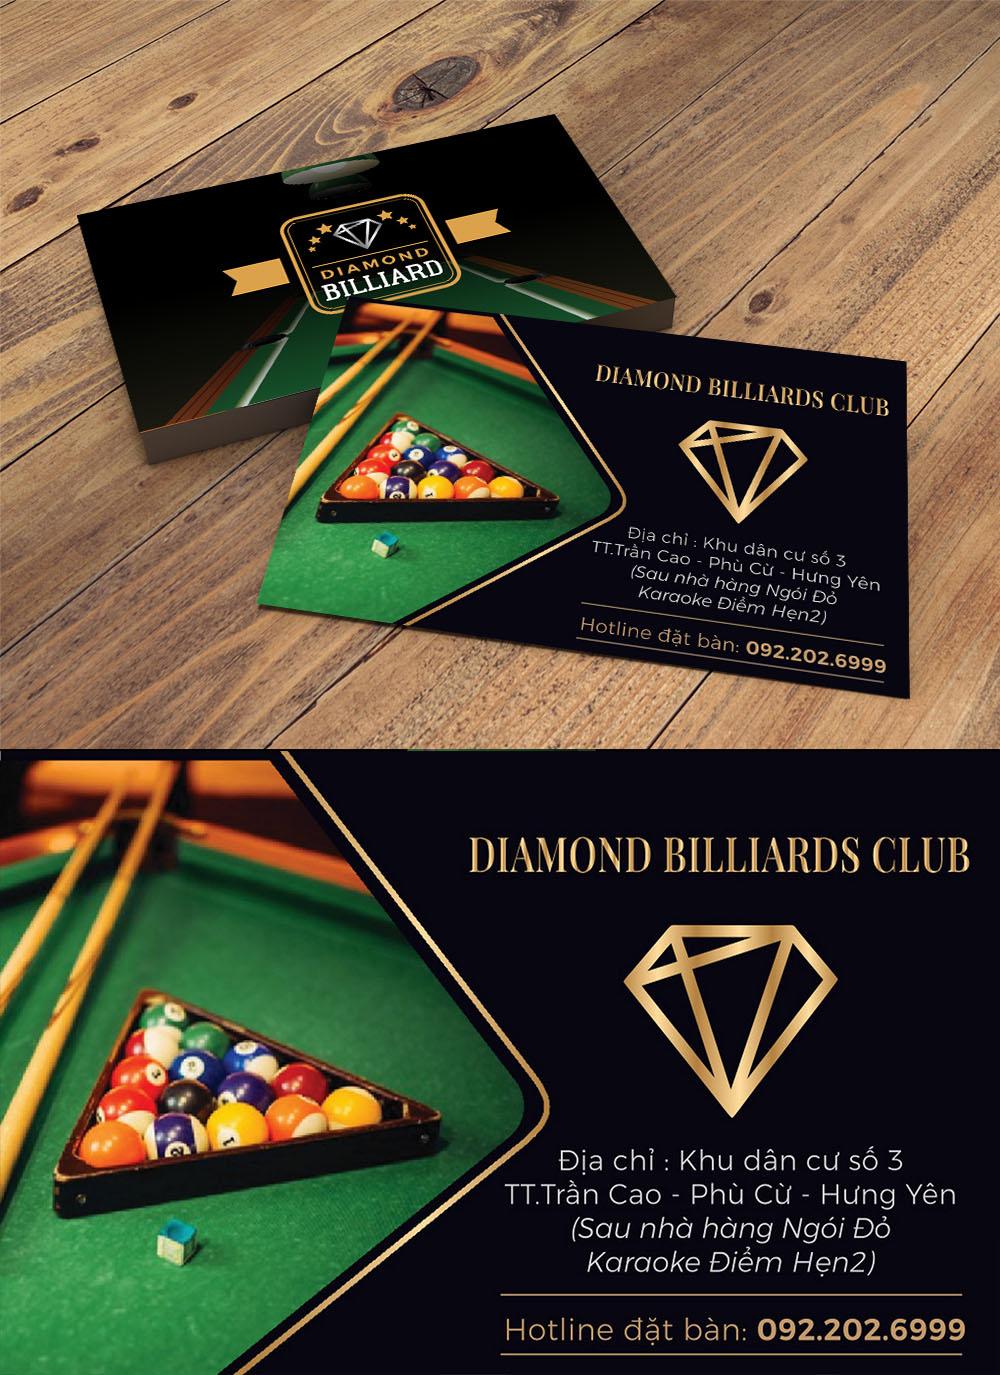 Mẫu danh thiếp namecard tiệm bi a diamond